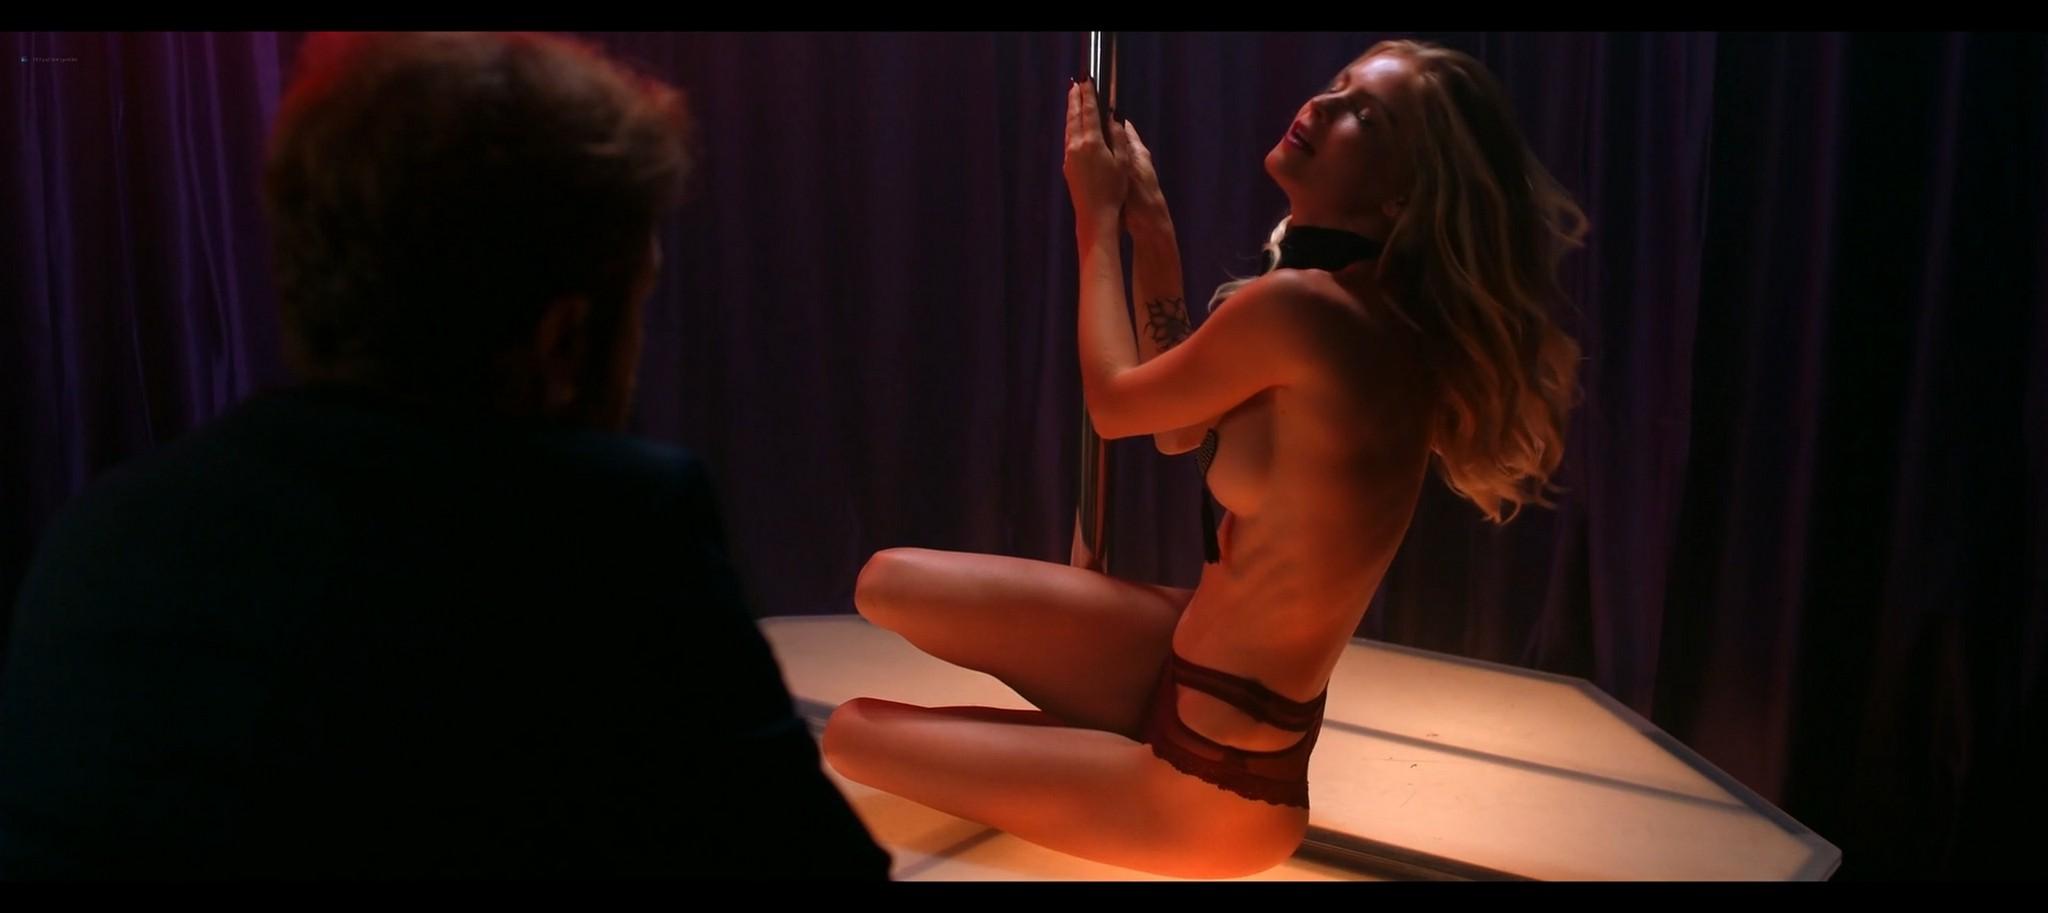 Kenzie Dalton hot Drue Knapp Ava Locklear sexy A Dark Foe 2021 1080p Web 12